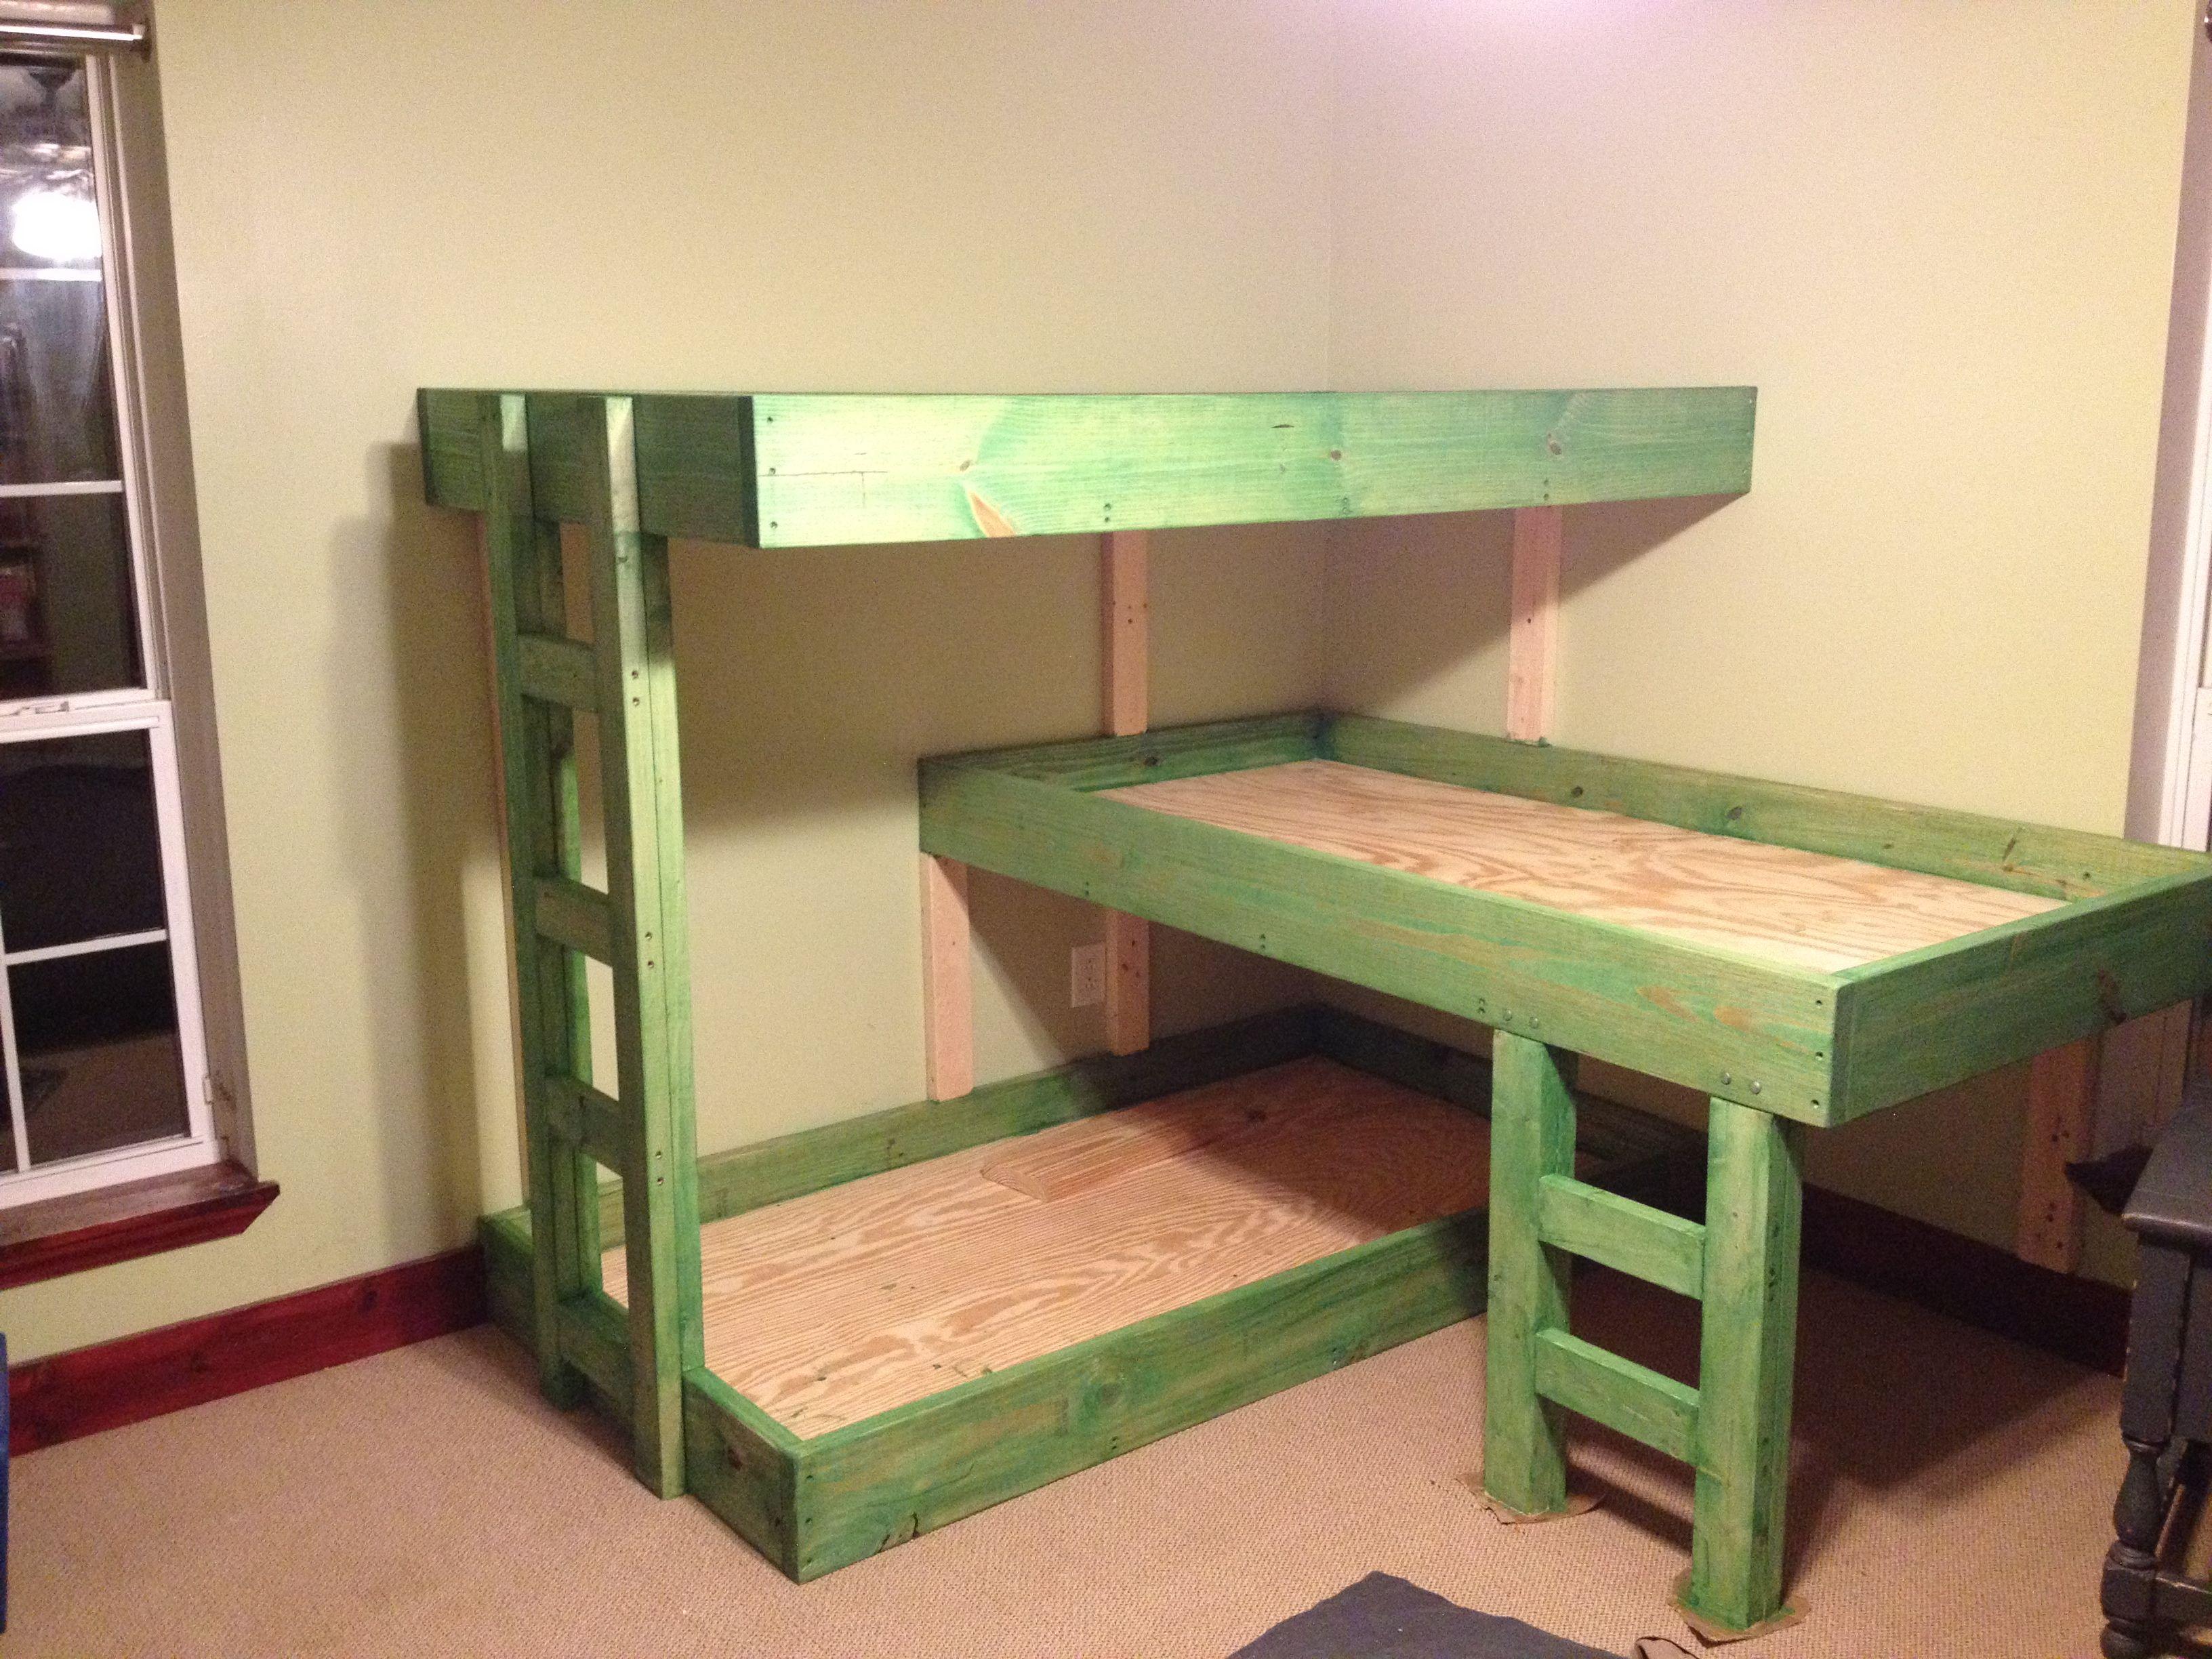 Homemade loft bed ideas  Homemade Almond Milk Recipe Video  Triple bunk beds Bunk bed plans